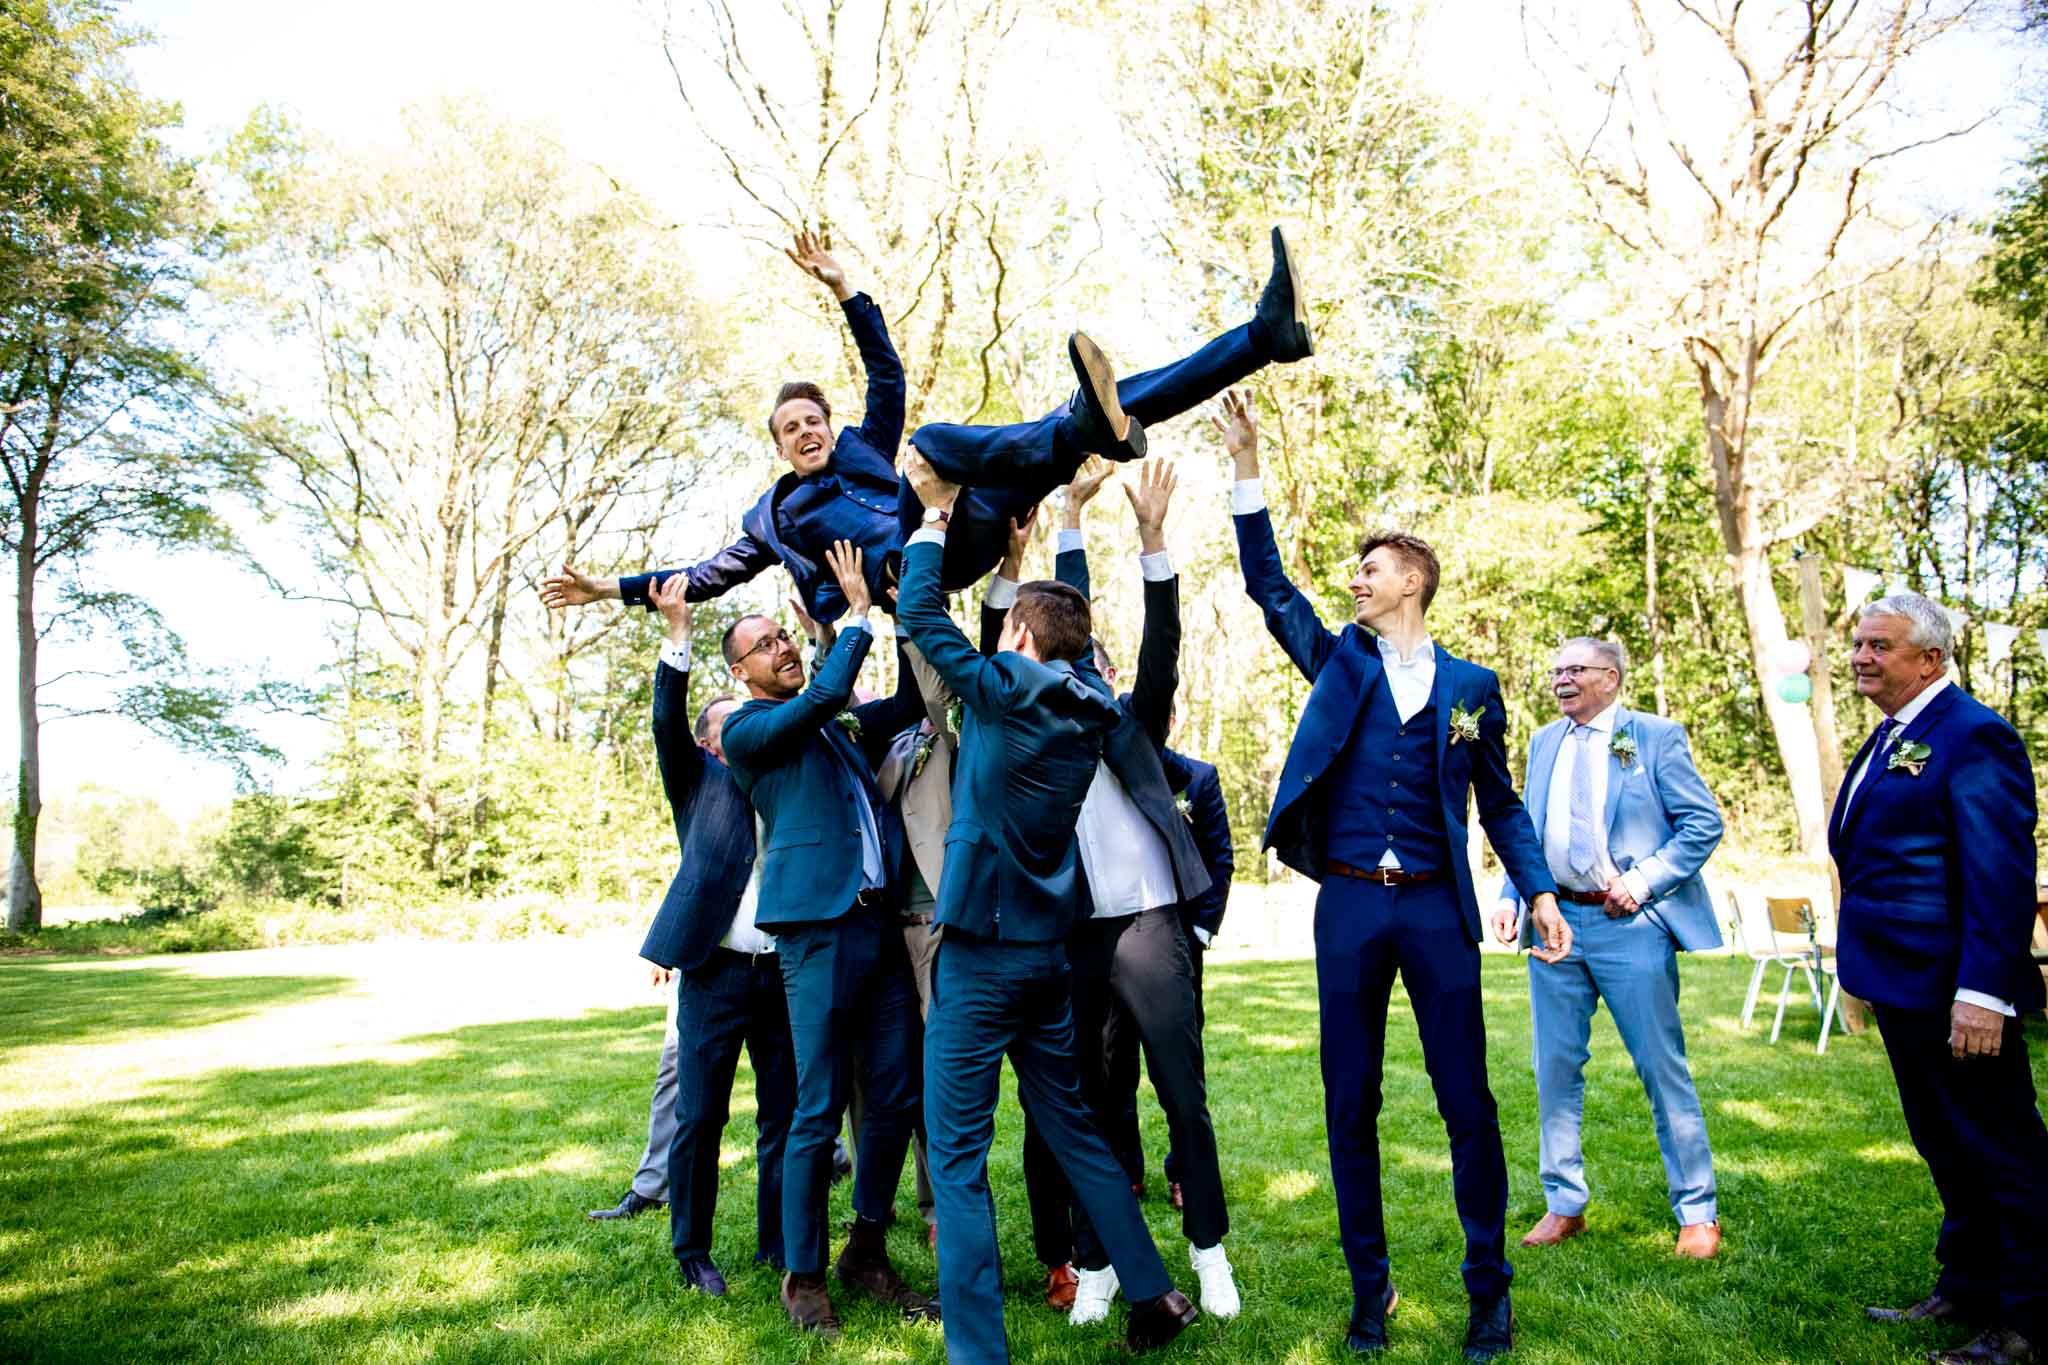 trouwfotograaf, trouwfotografie, spontane fotografie, wilhelminaoord